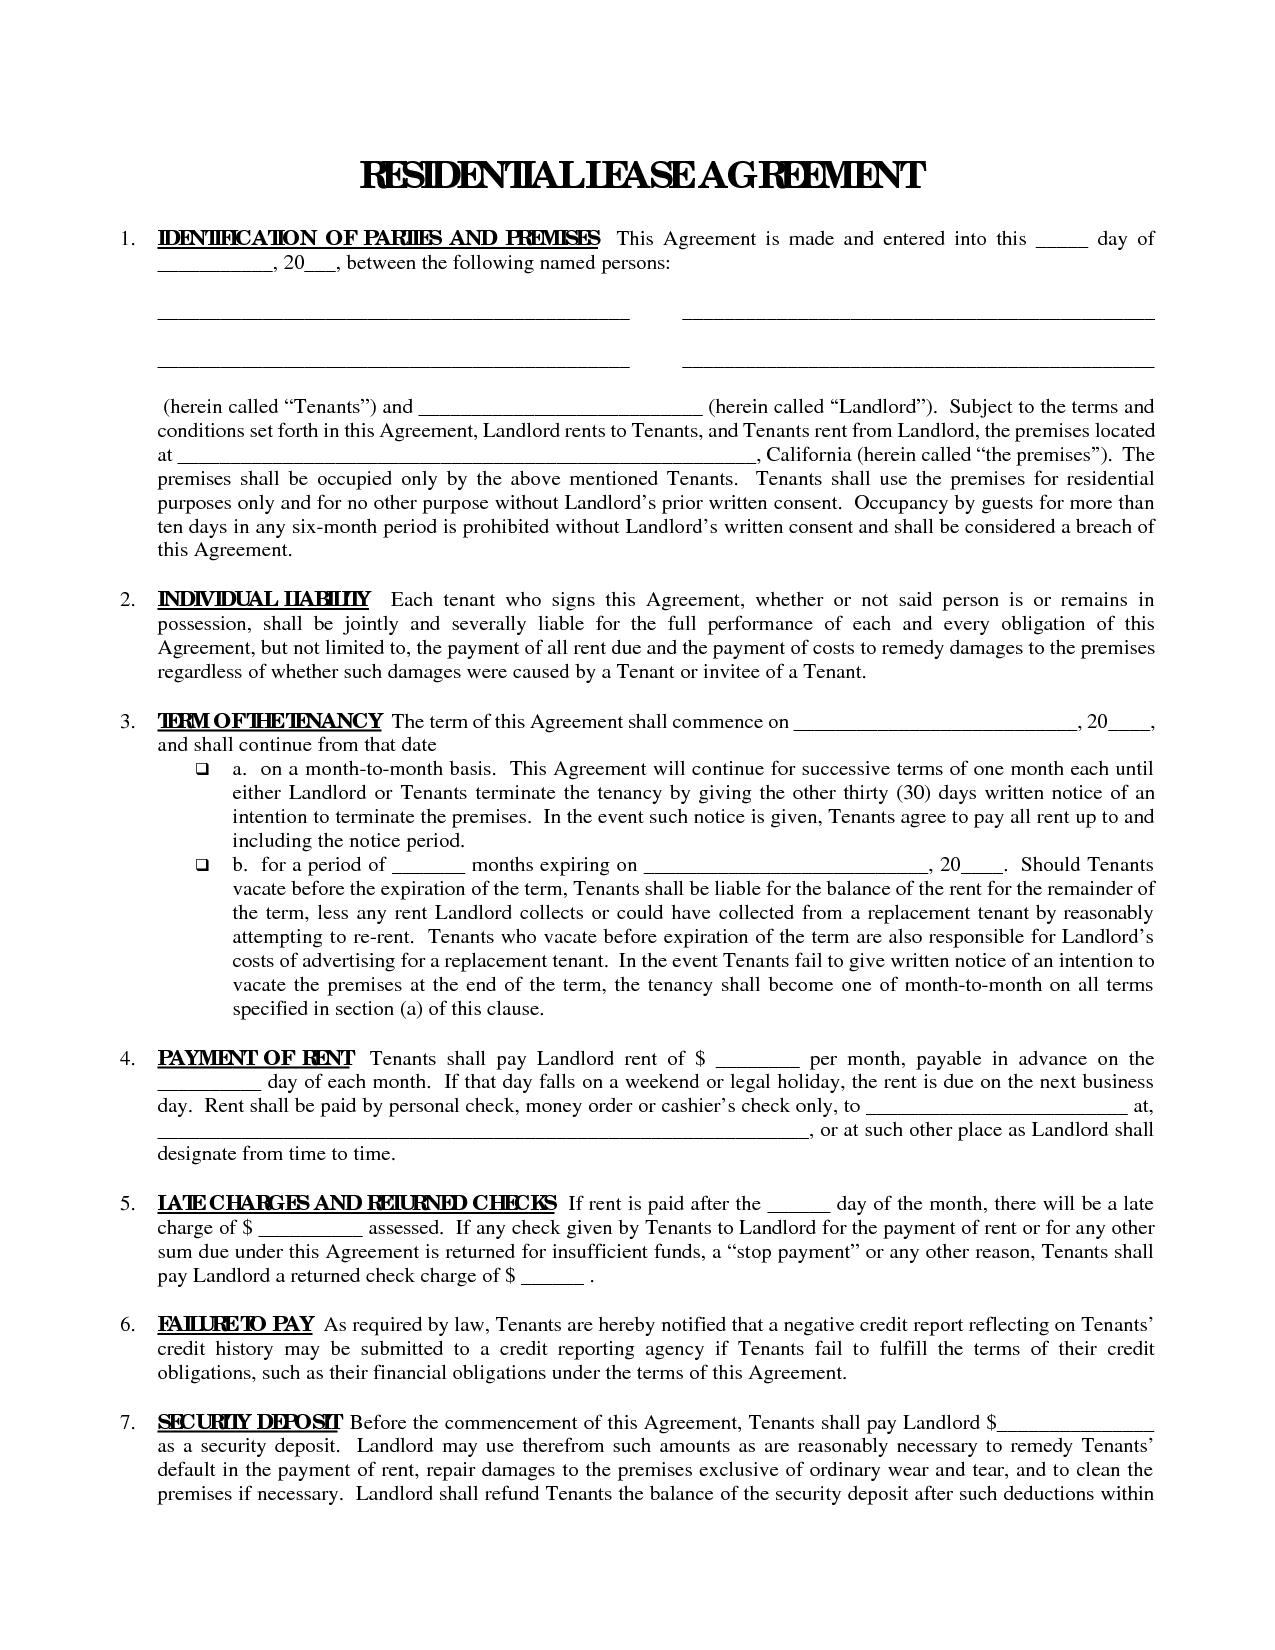 Printable Residential Free House Lease Agreement | Residential Lease - Apartment Lease Agreement Free Printable